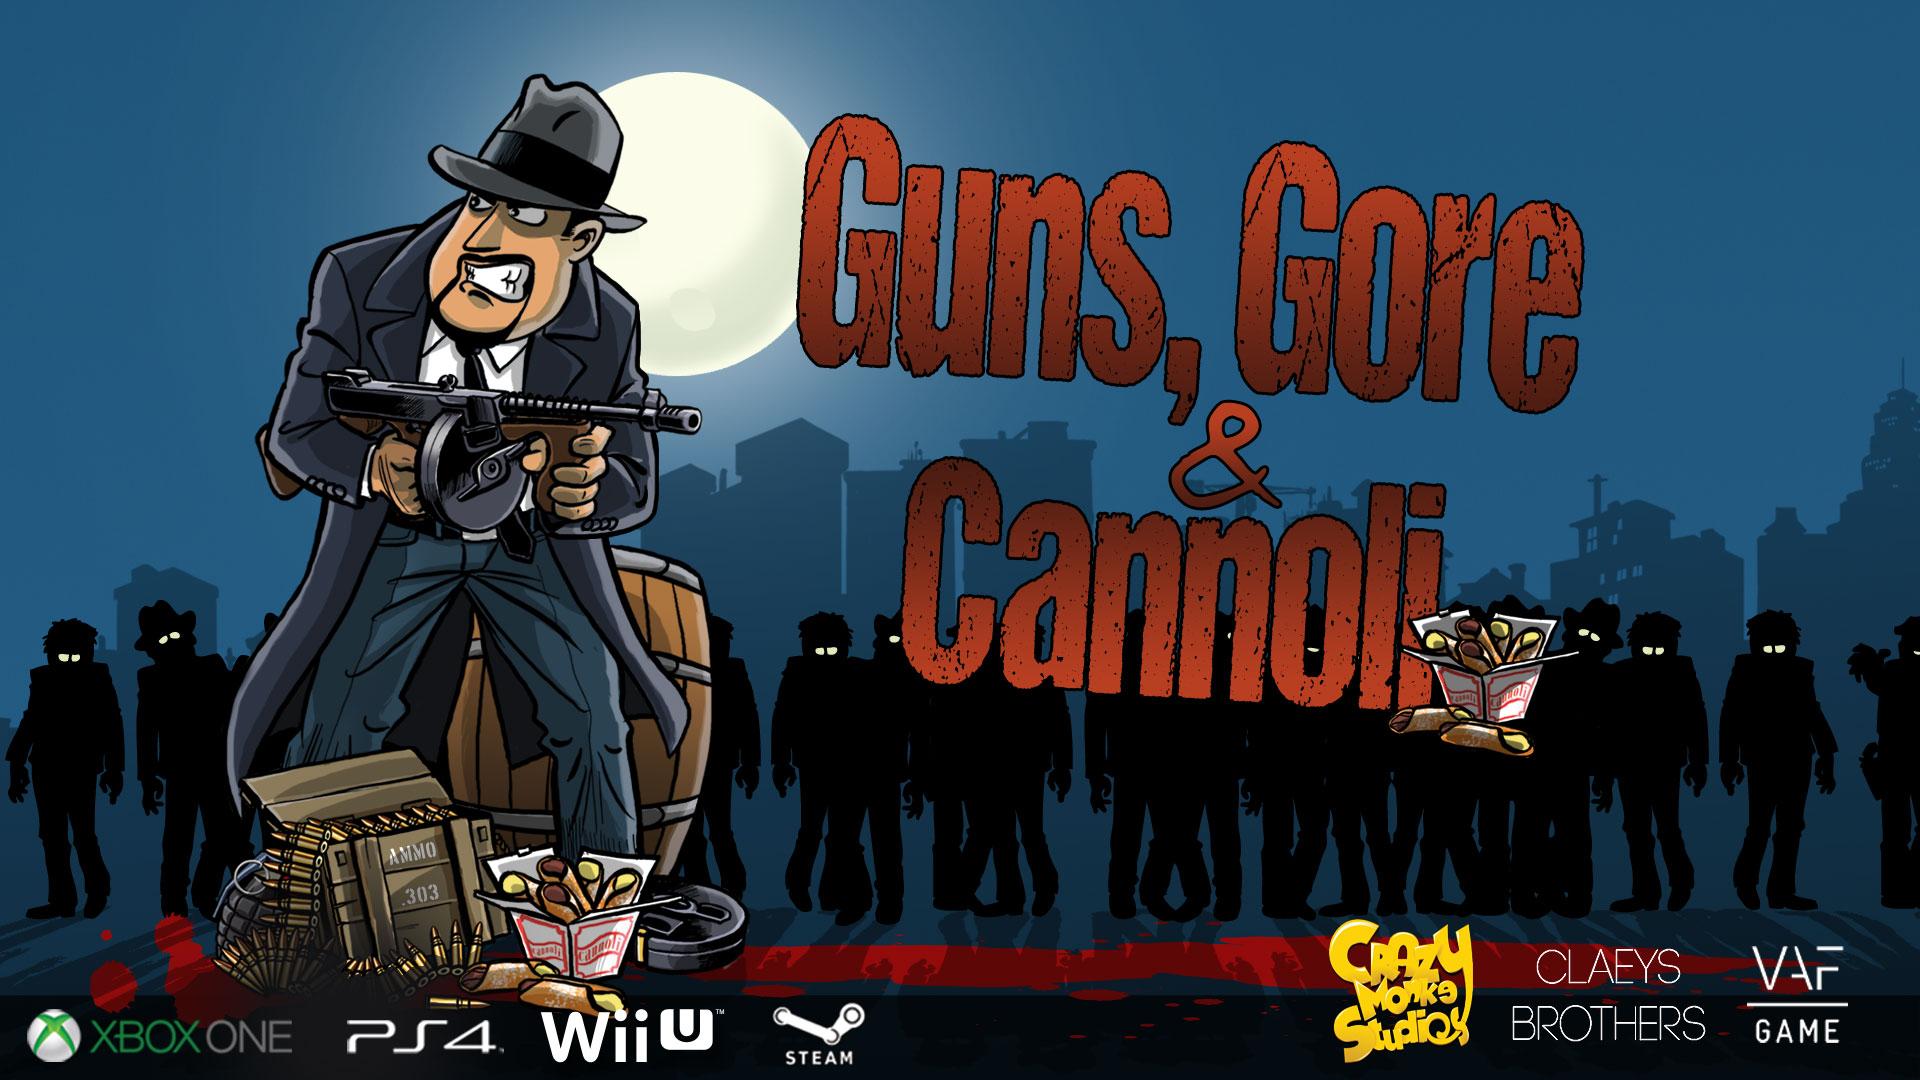 High Resolution Wallpaper | Guns, Gore & Cannoli 1920x1080 px